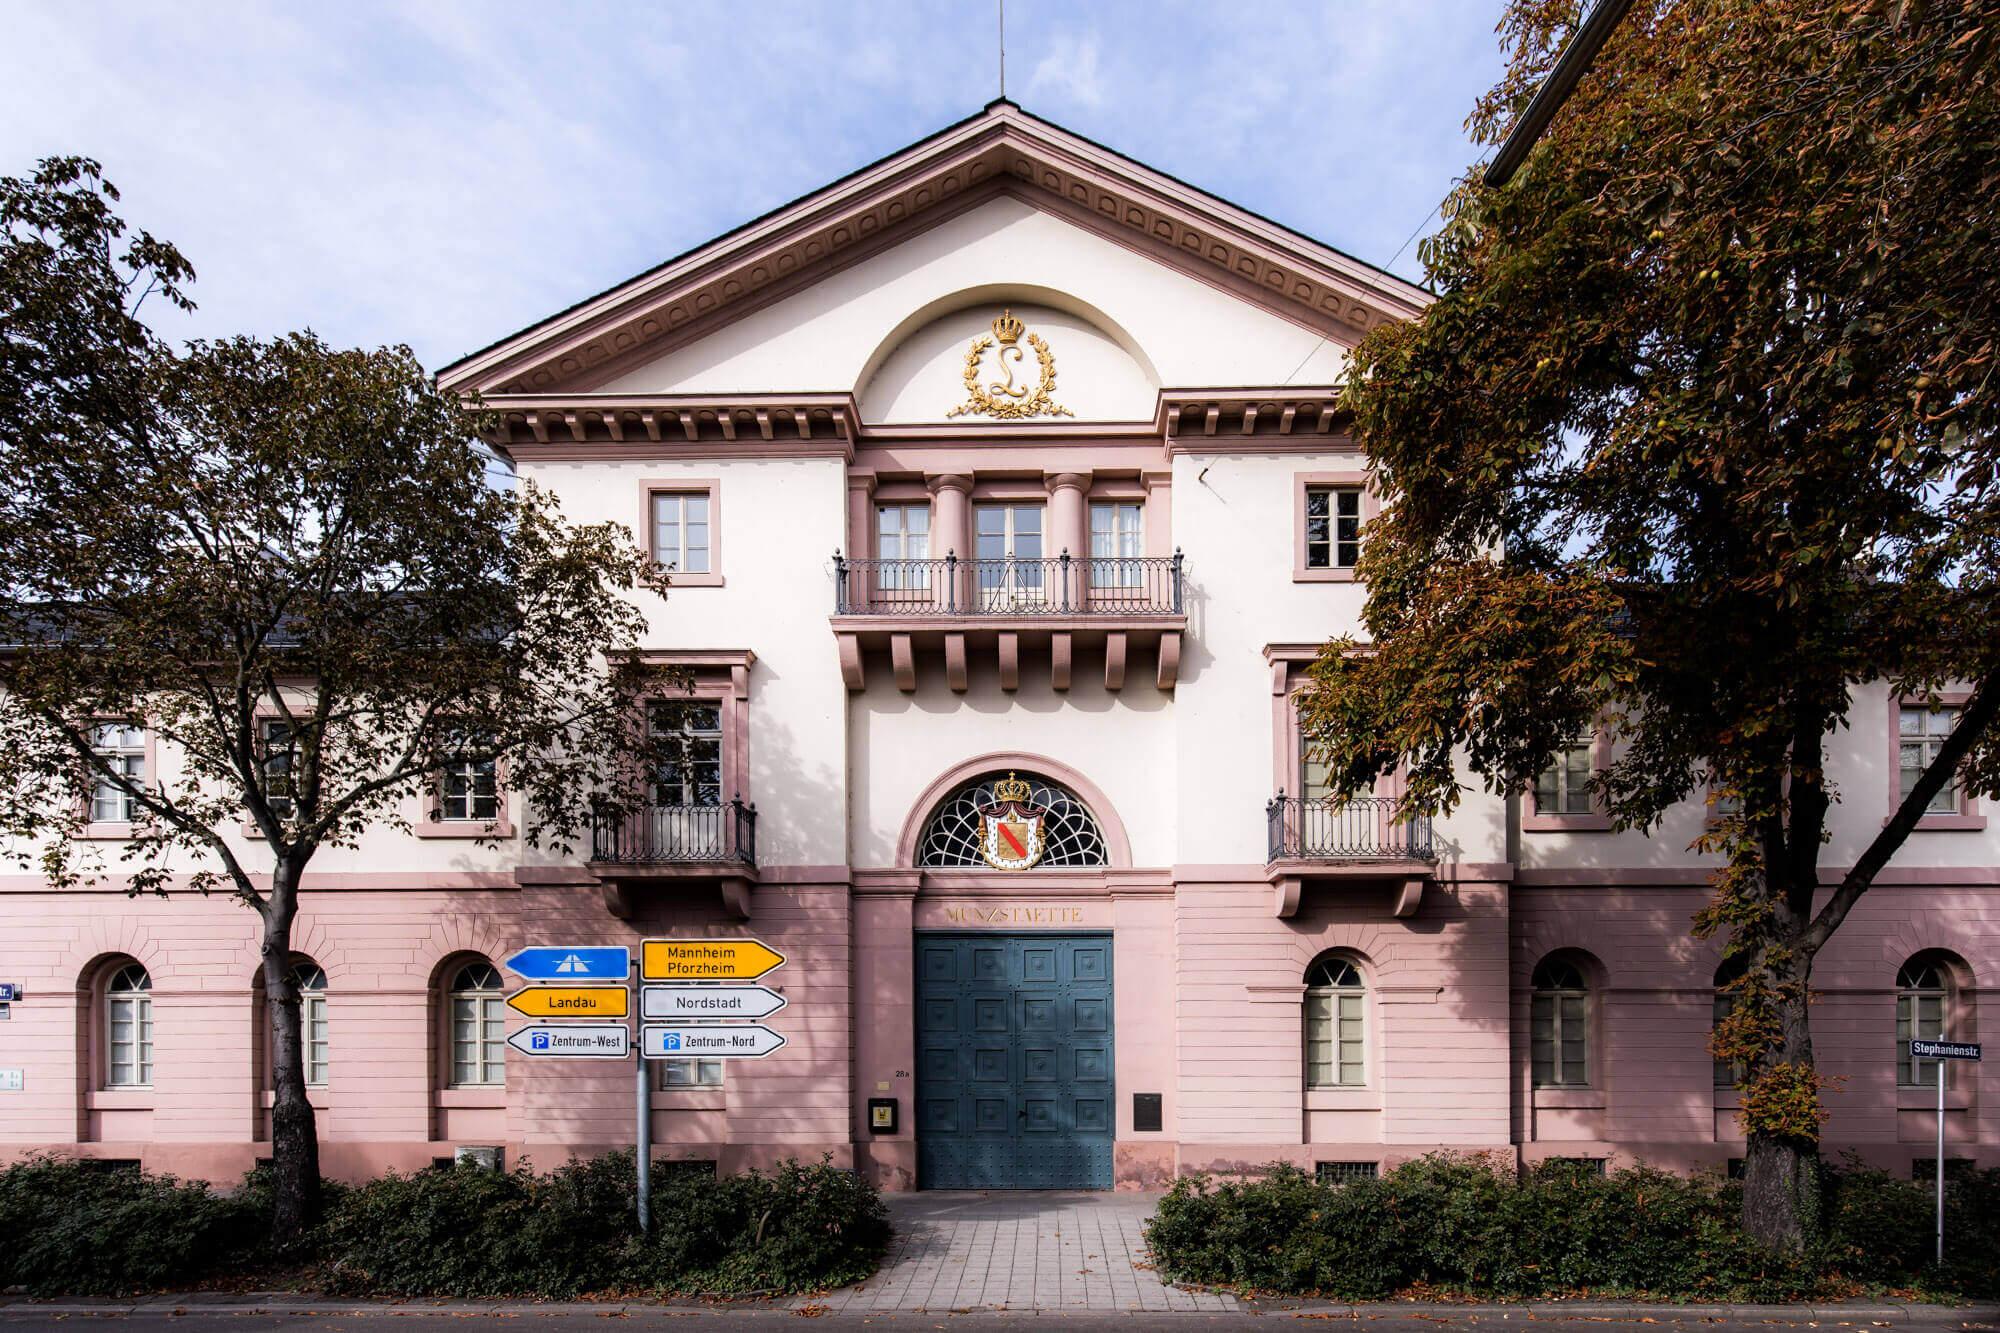 Münzstätte Karlsruhe